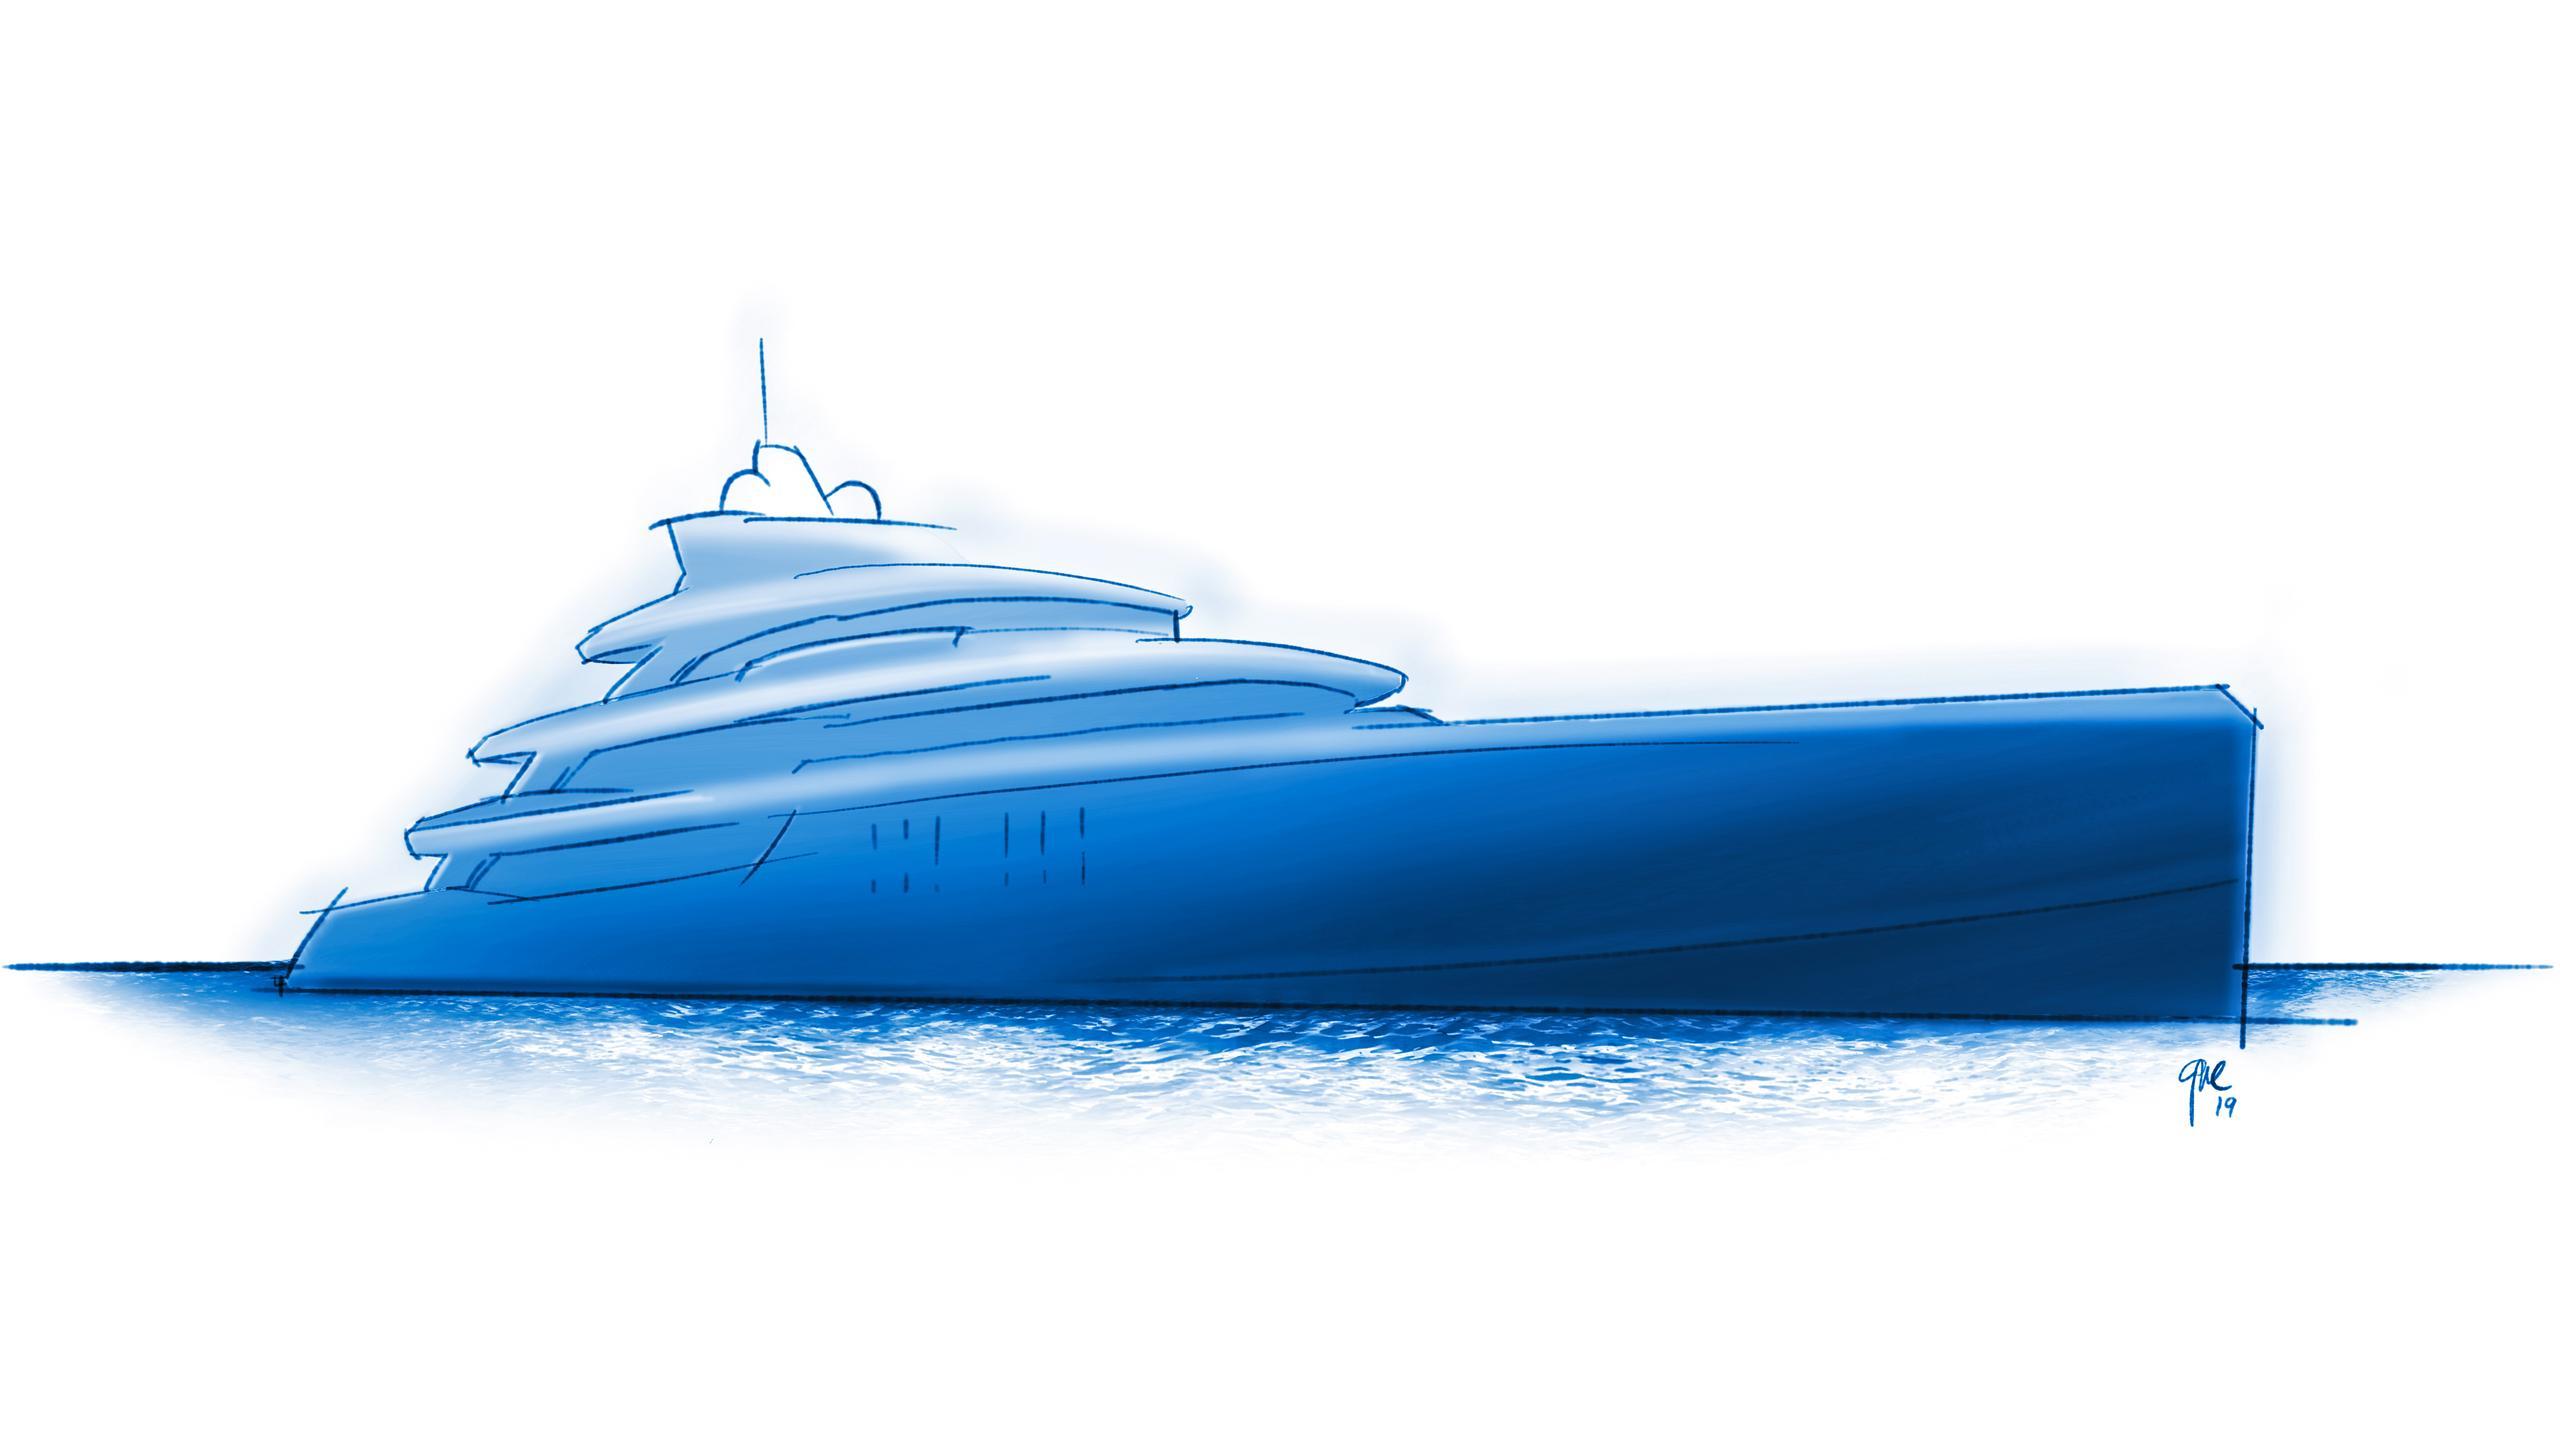 project fenestra motoryacht benetti fb278 67m 2021 rendering